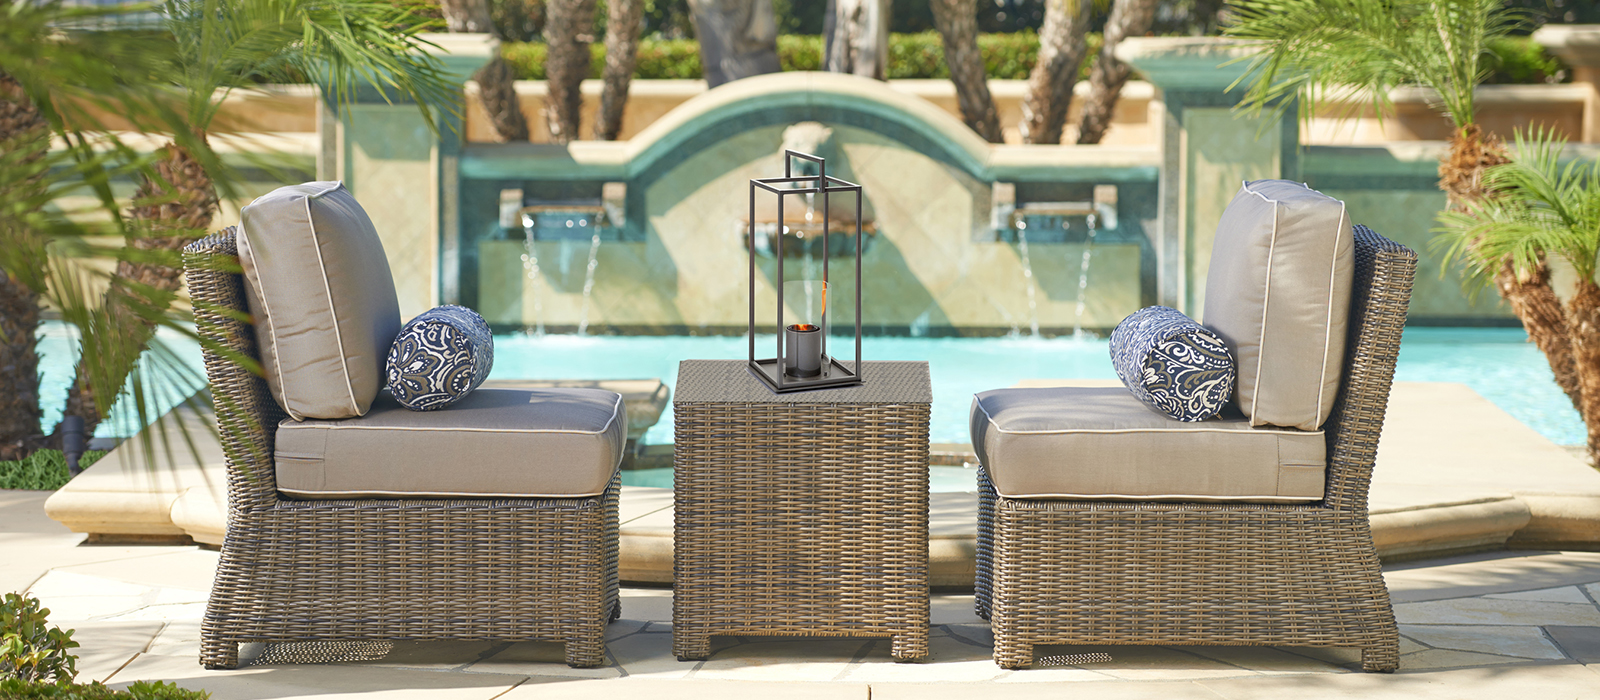 Sunshine Wicker and Design | Coastal and tropical quality